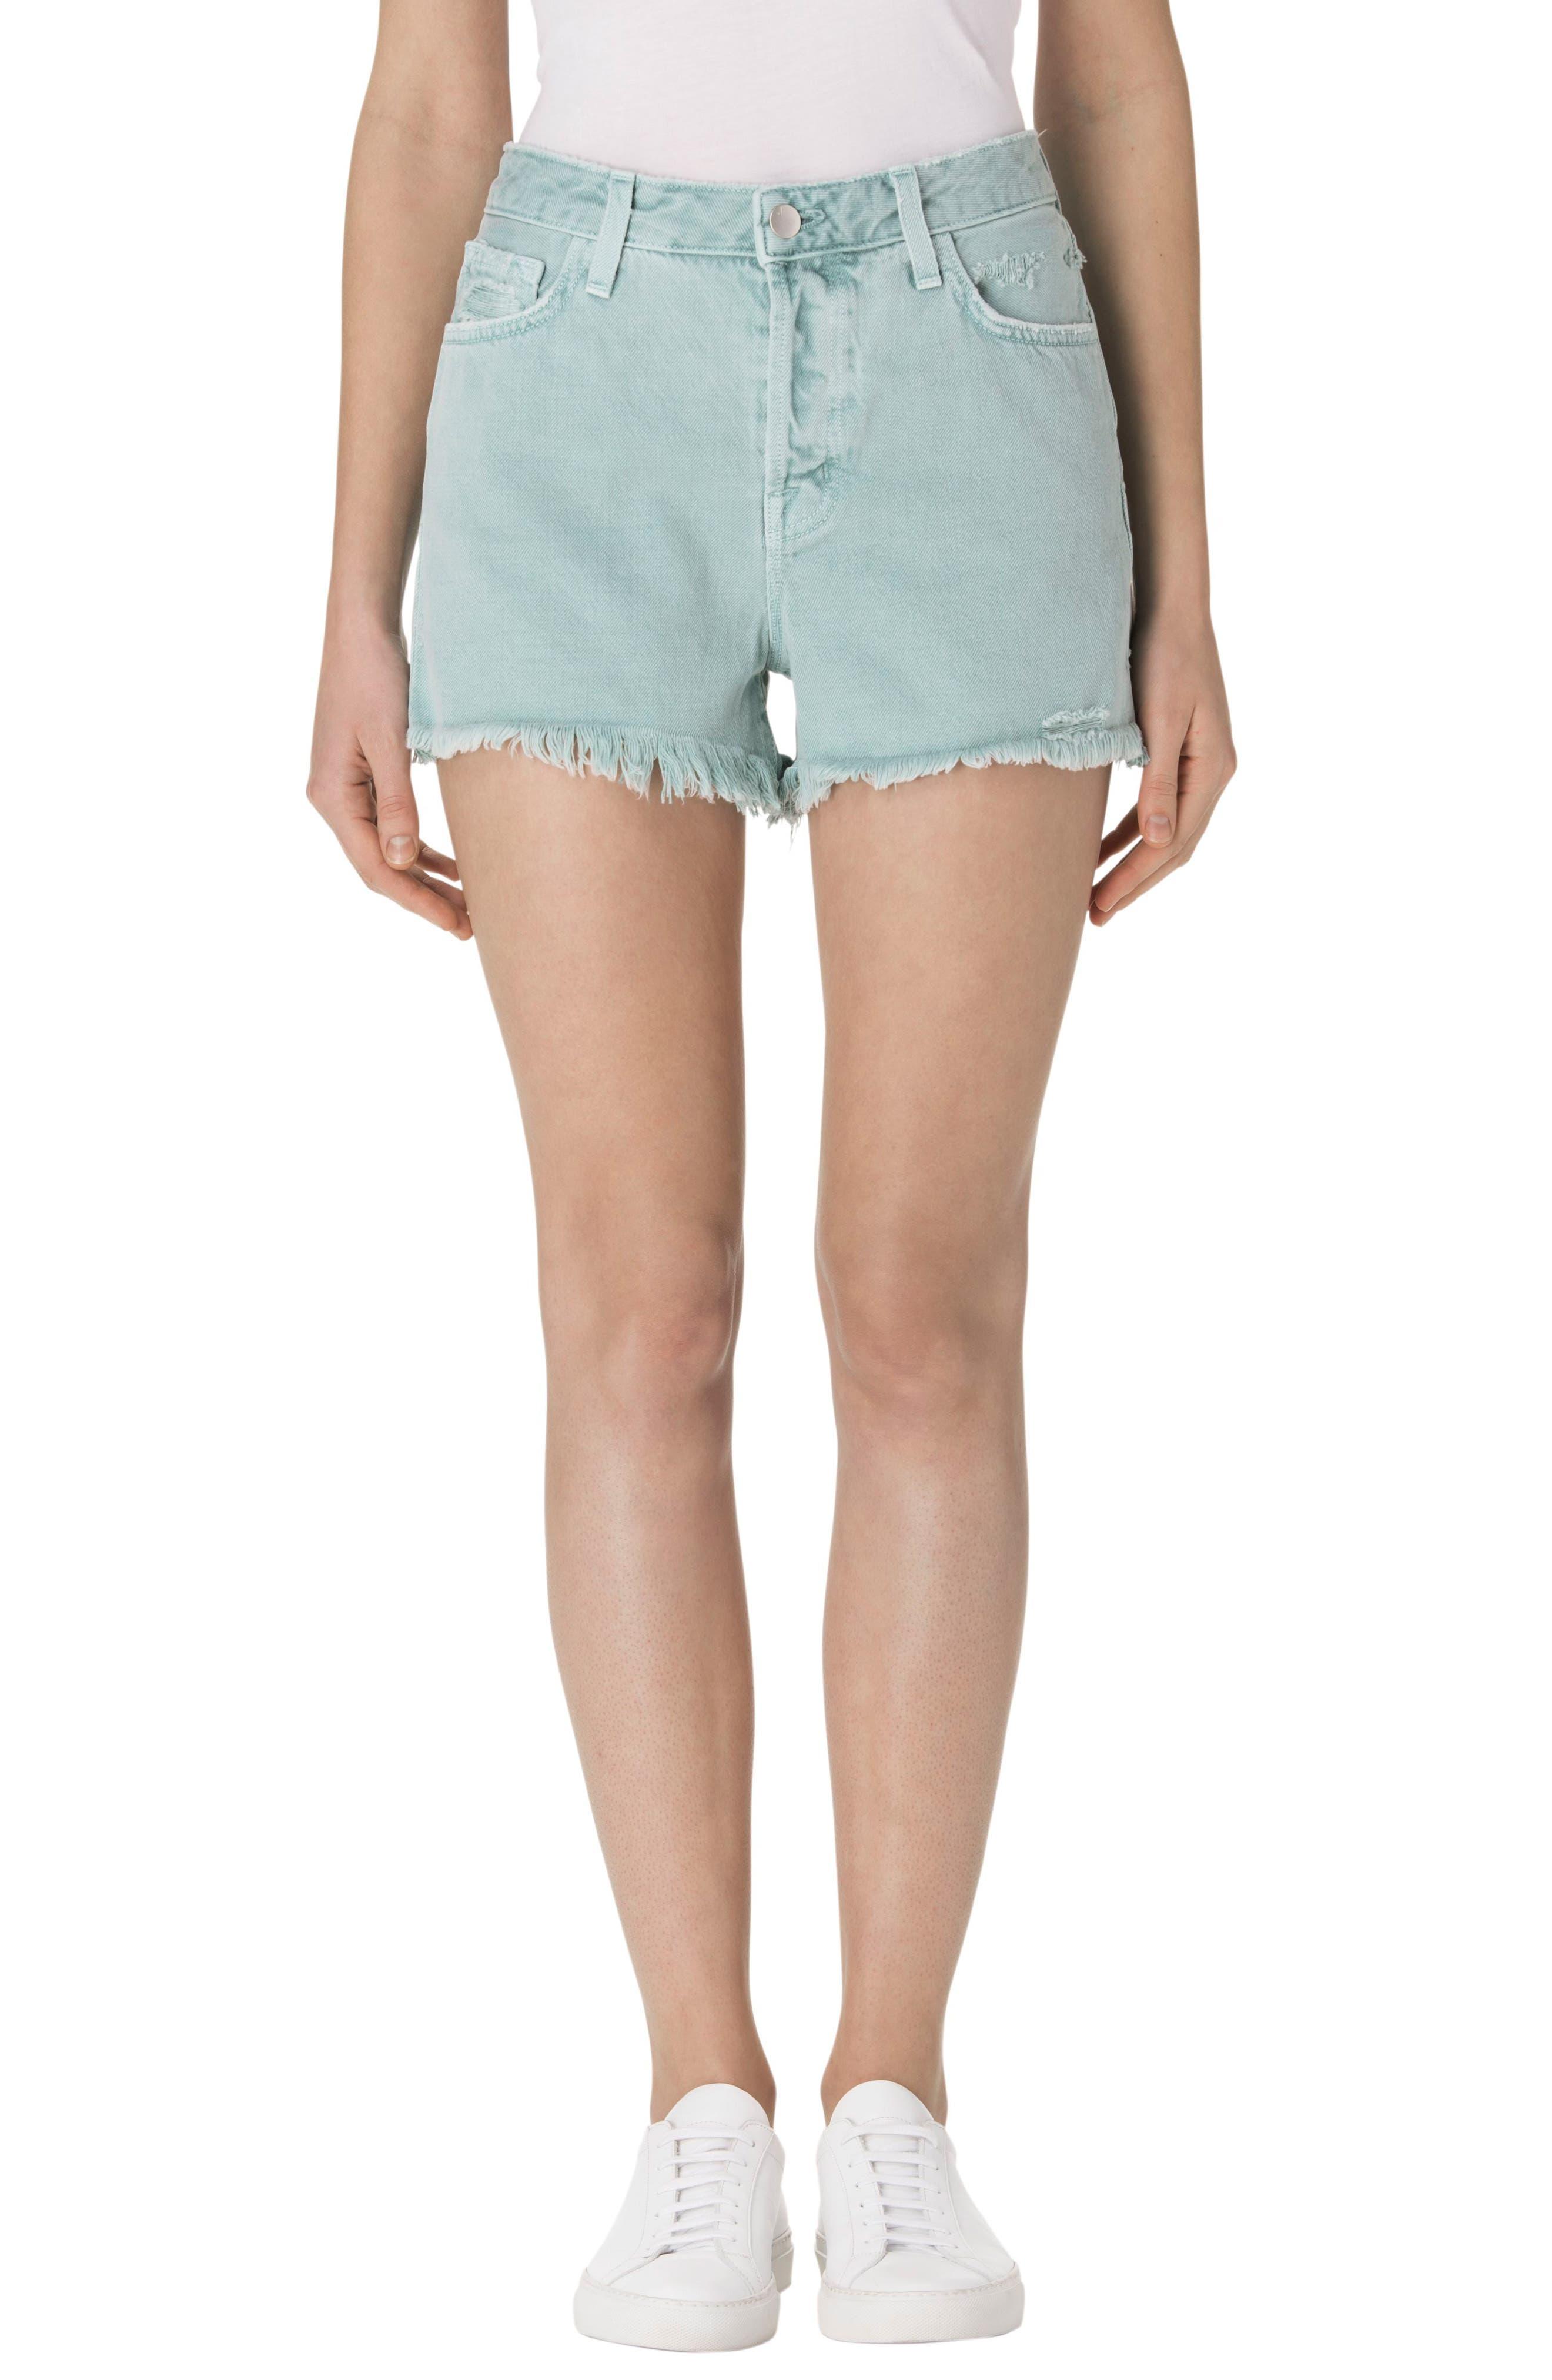 J Brand Gracie High Waist Cutoff Shorts